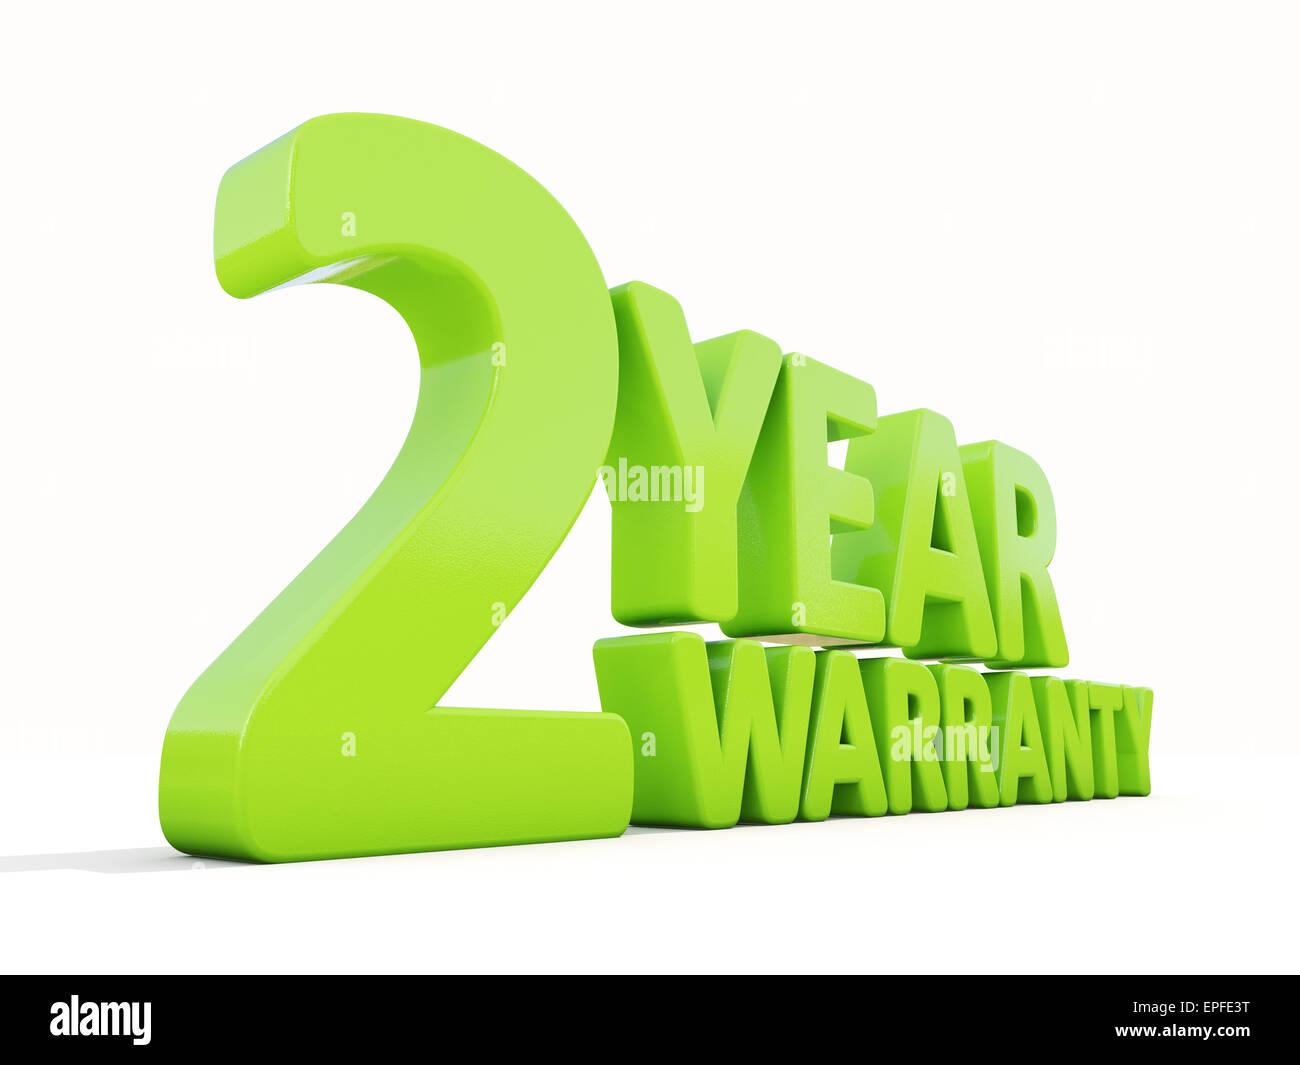 Warranty - Stock Image